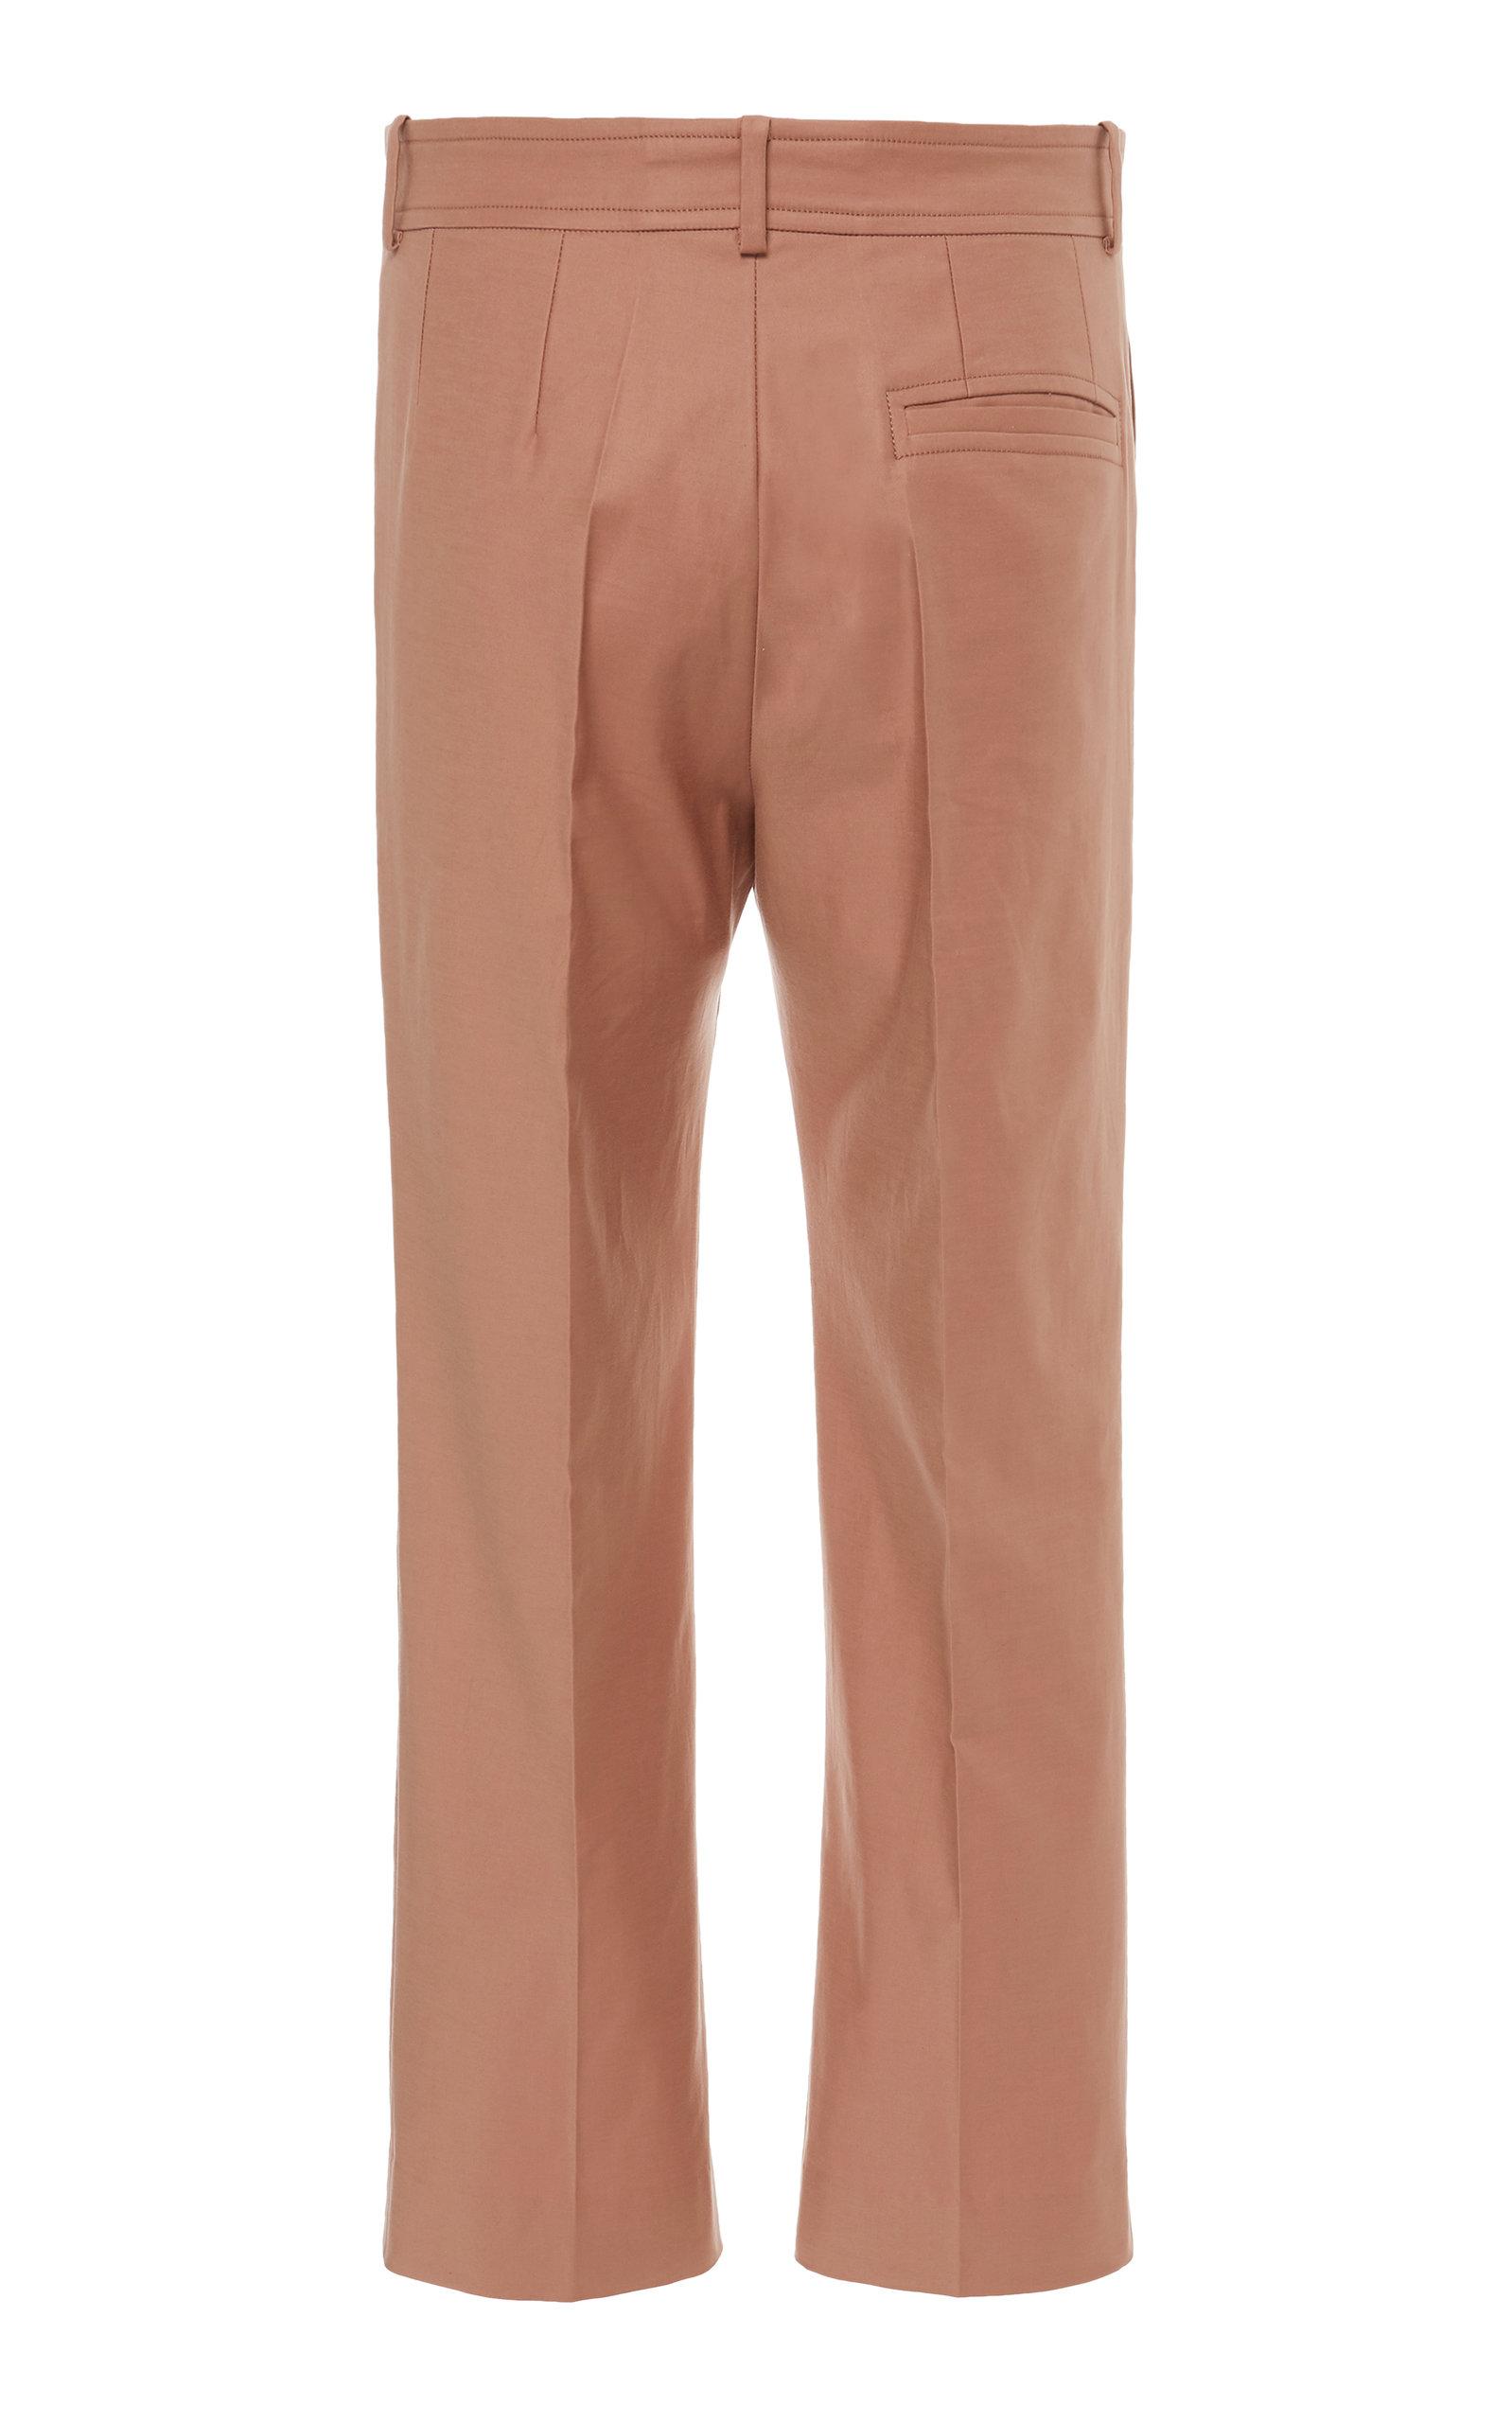 Harga Dan Spesifikasi Basic Straight Cut Long Pants Termurah 2018 Cardinal Formal Slim Fit Office Abu 30 Moda Operandi